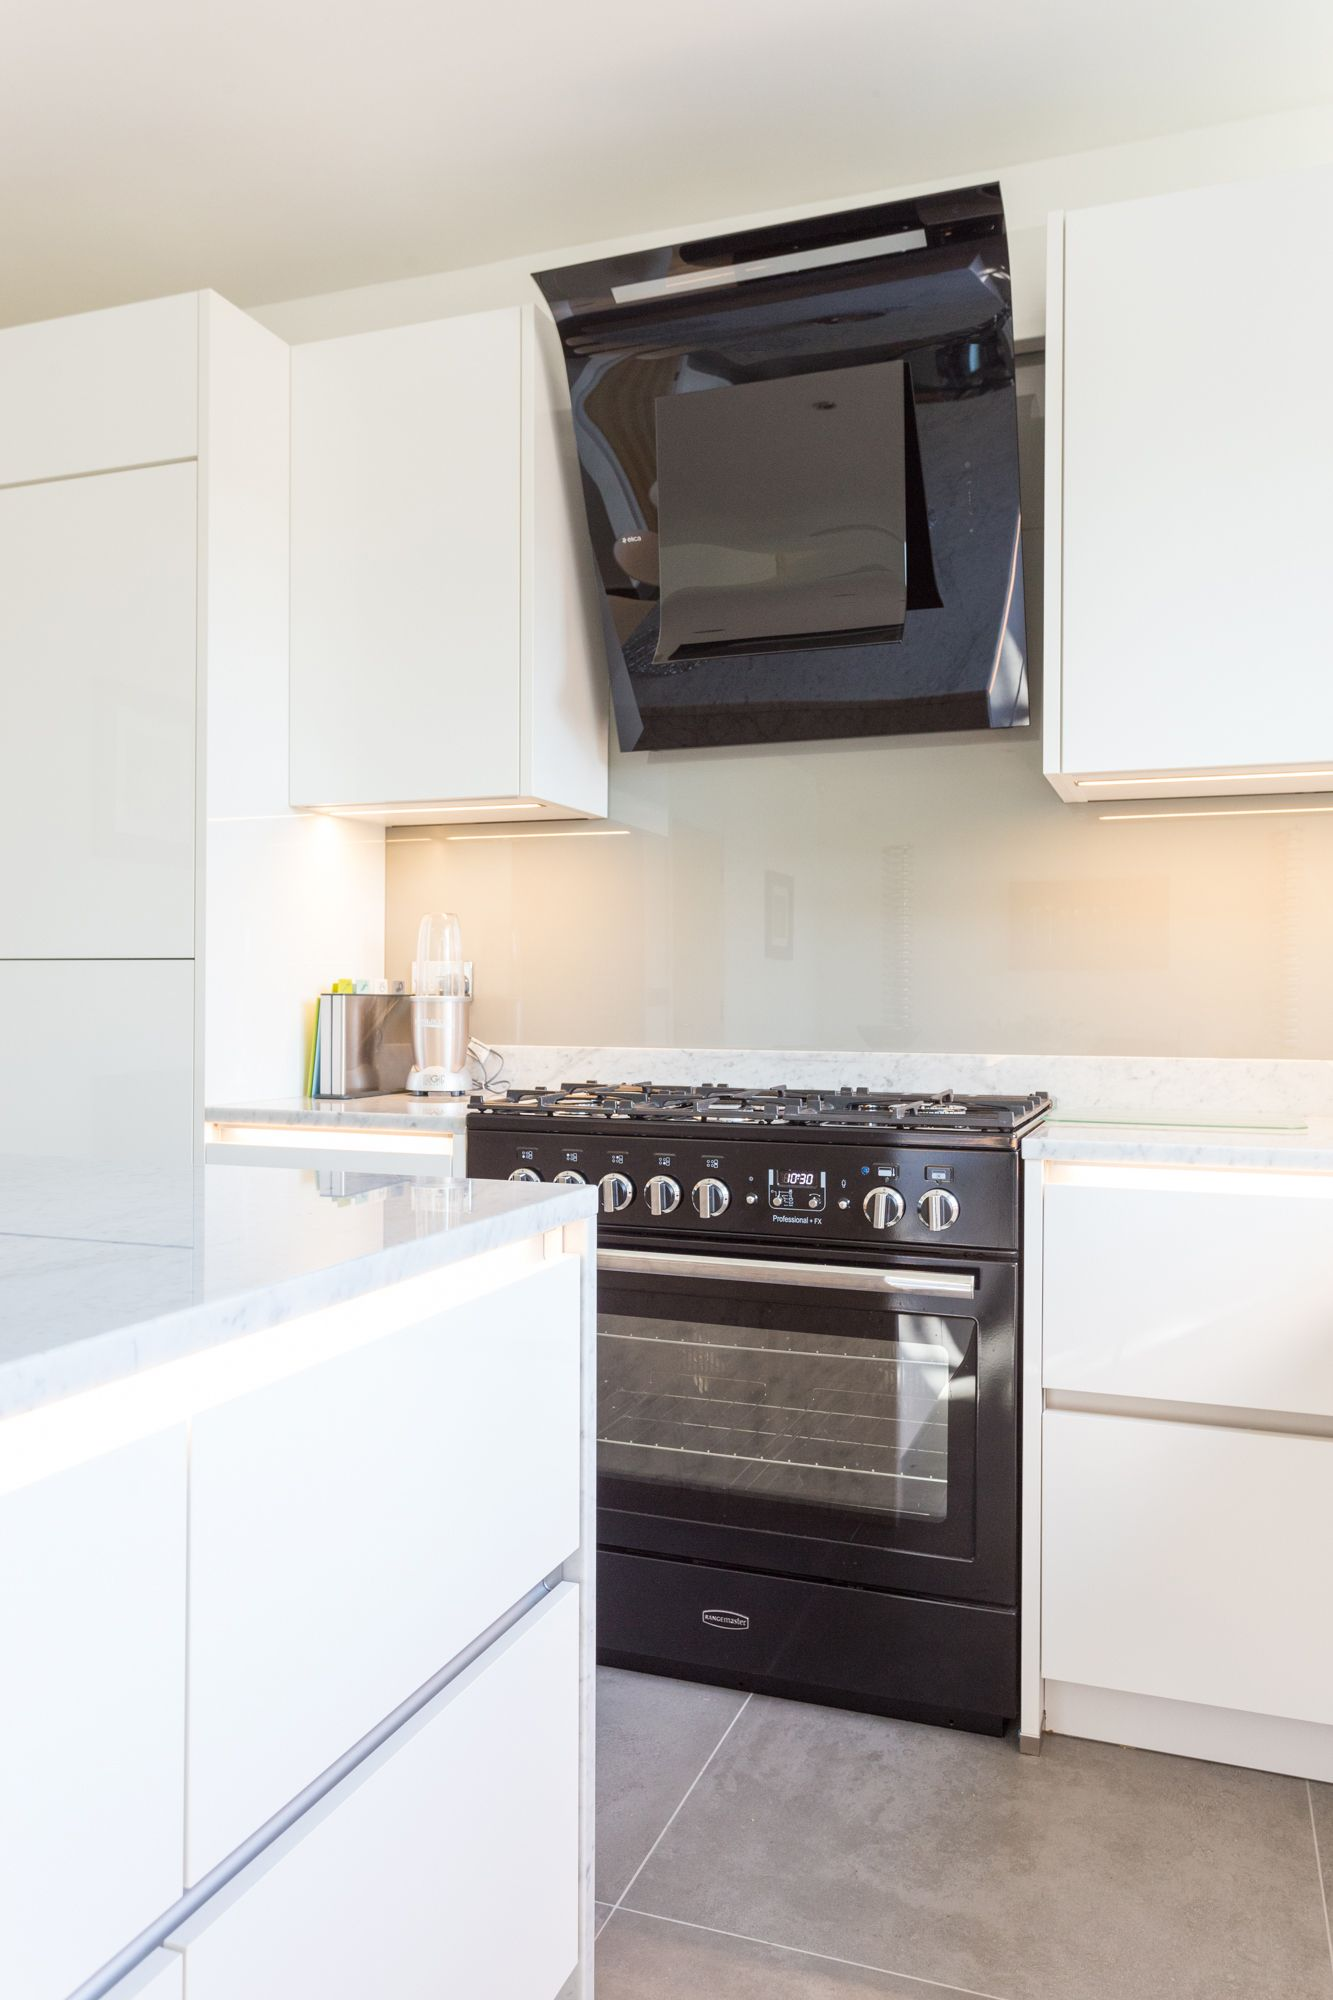 handleless german nolte kitchen in lux gloss white with matrix art rh pinterest com